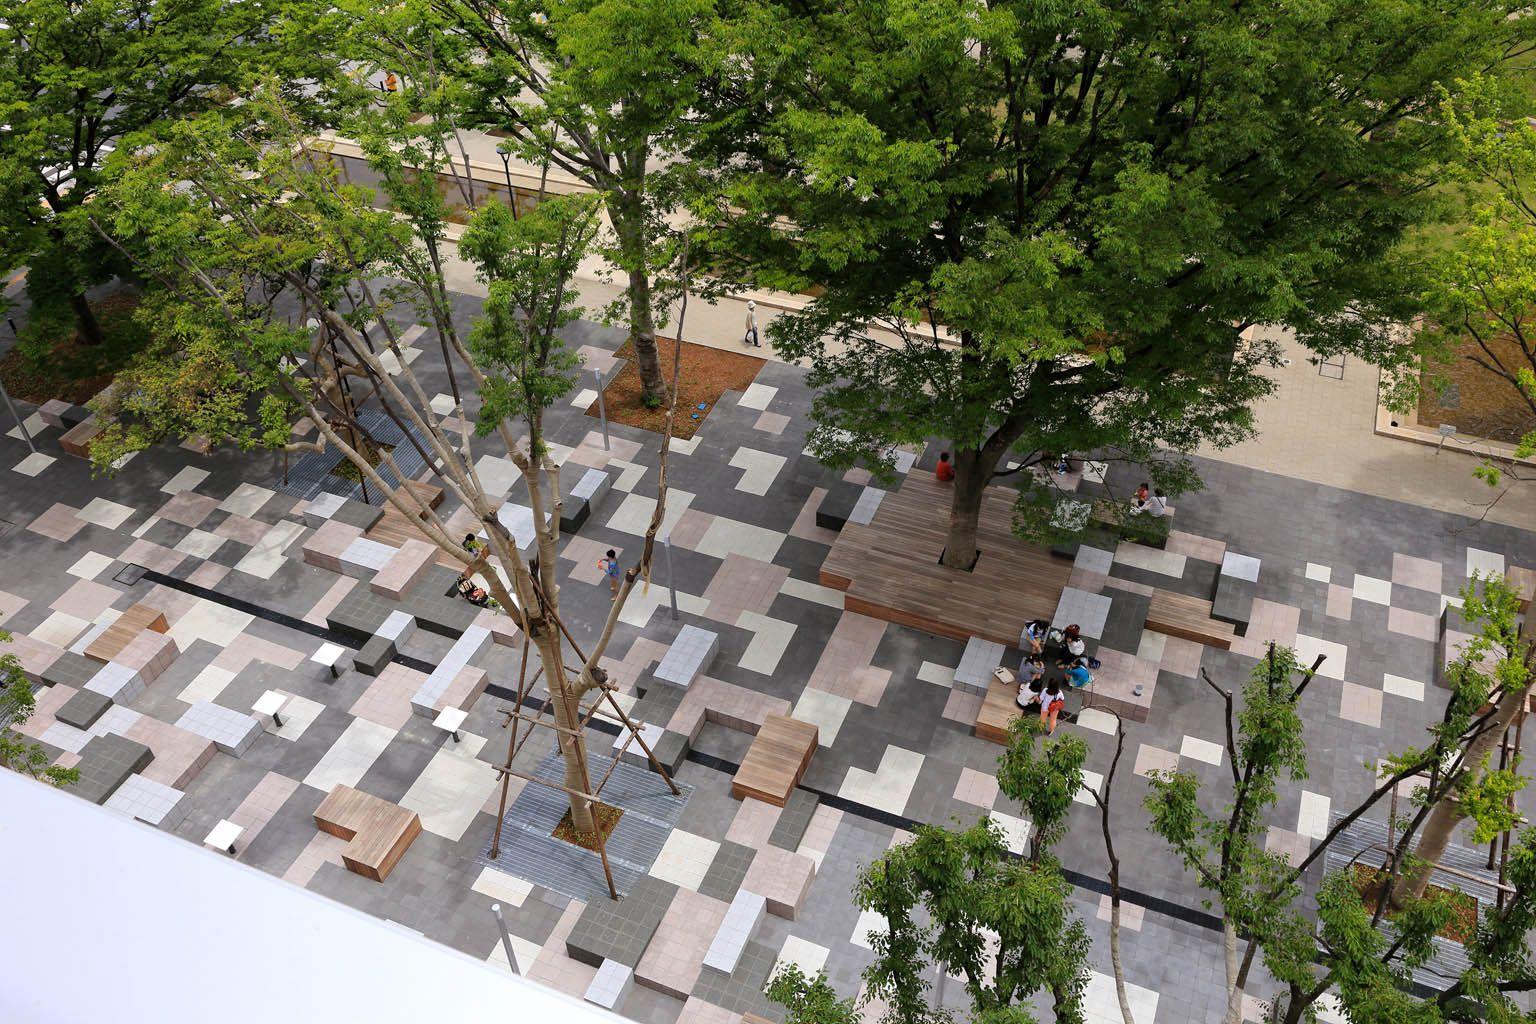 Works teikyo heisei university nakano university for Spaces landscape architecture